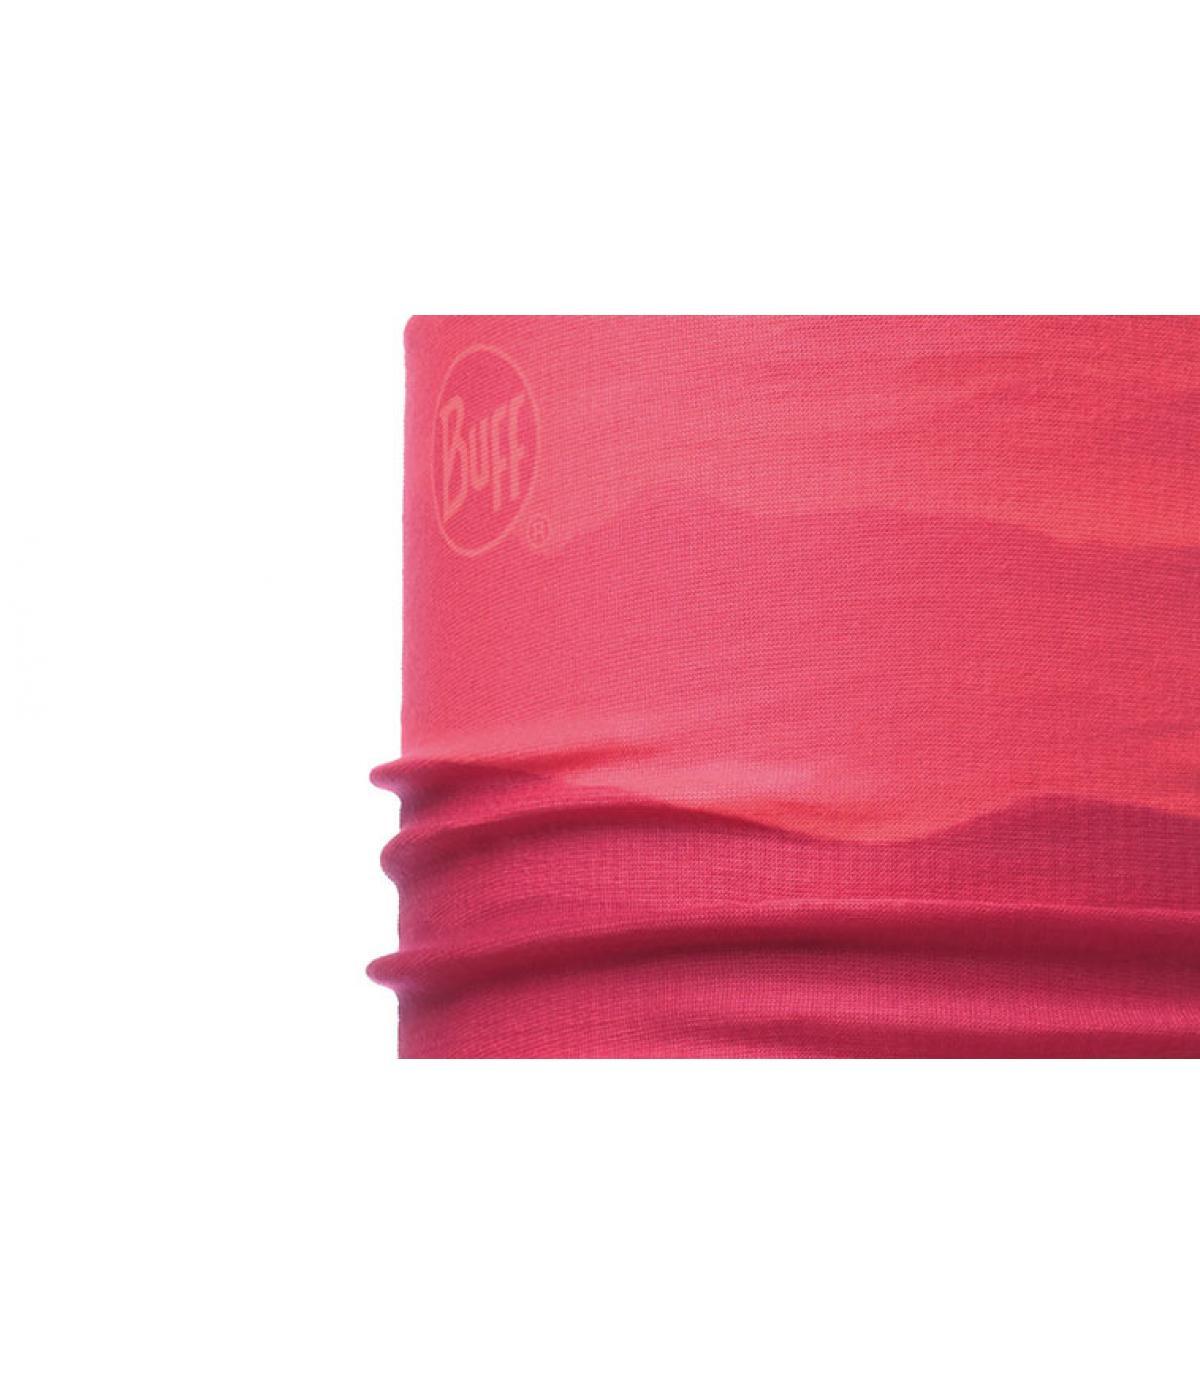 Détails Original soft hills pink fluo - image 2